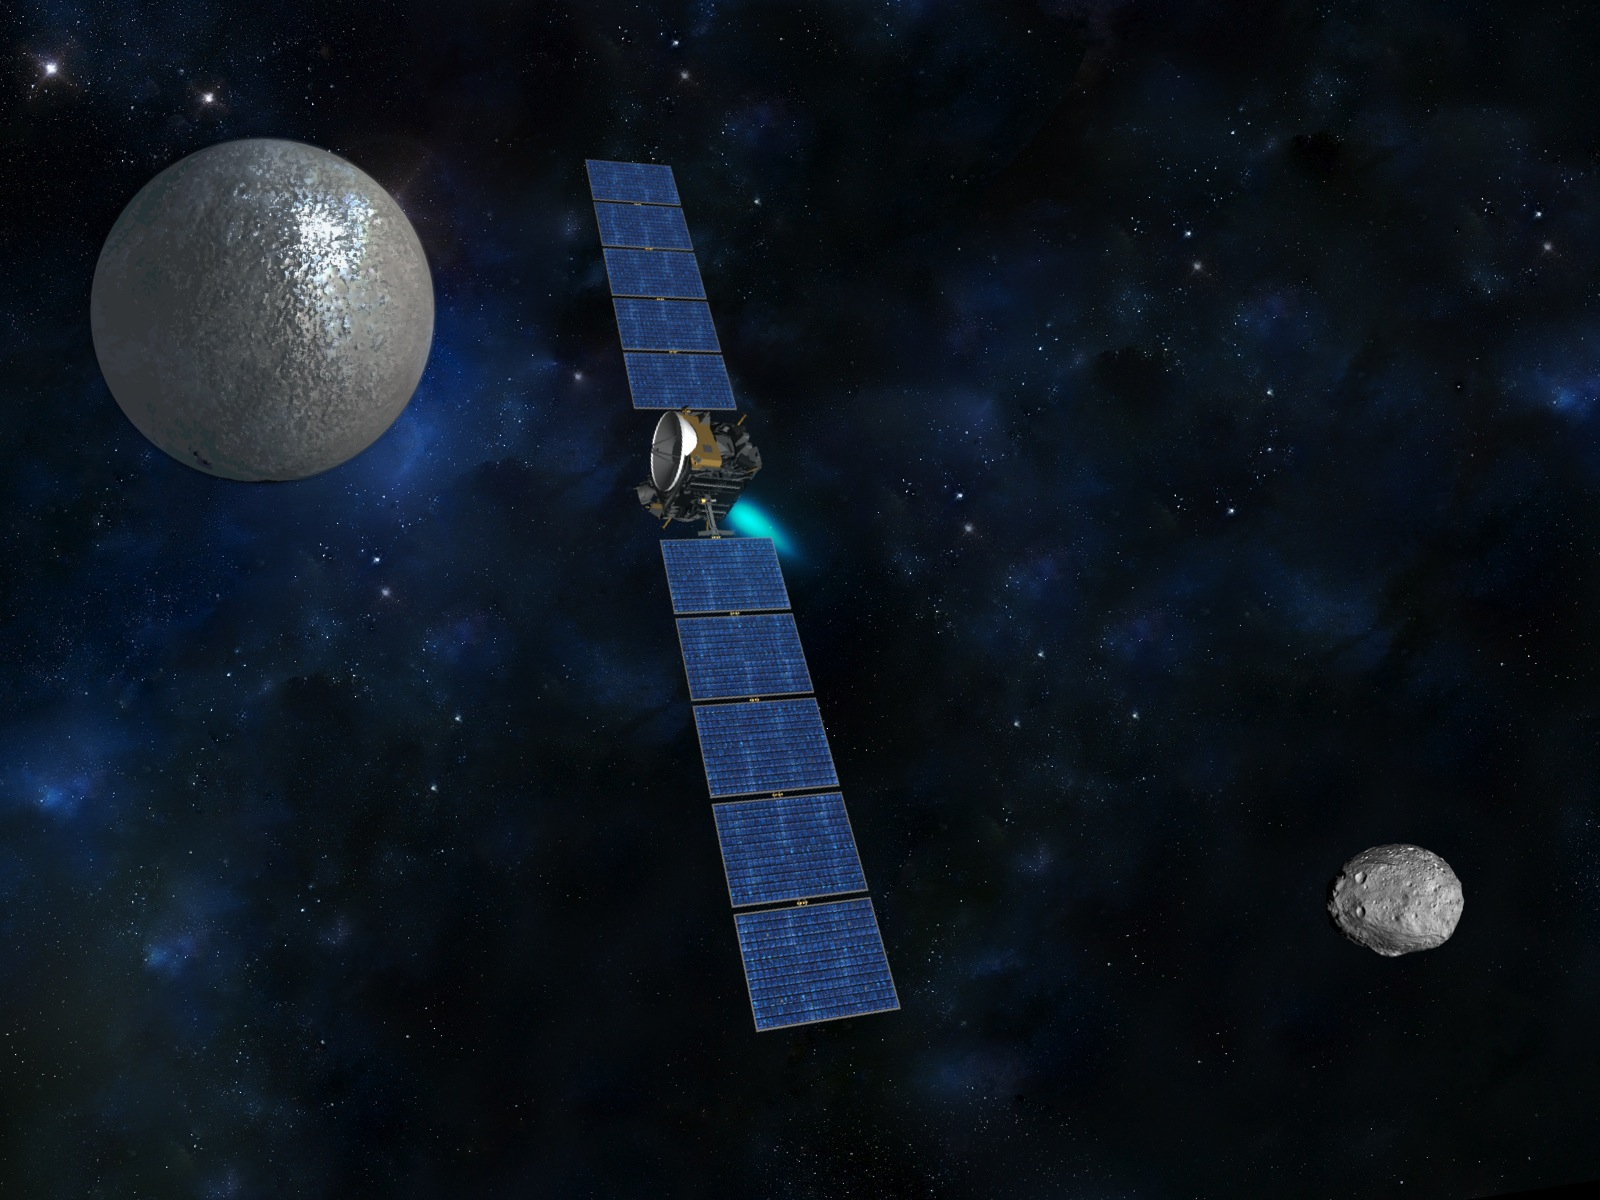 nasa dawn spacecraft diagram - photo #18